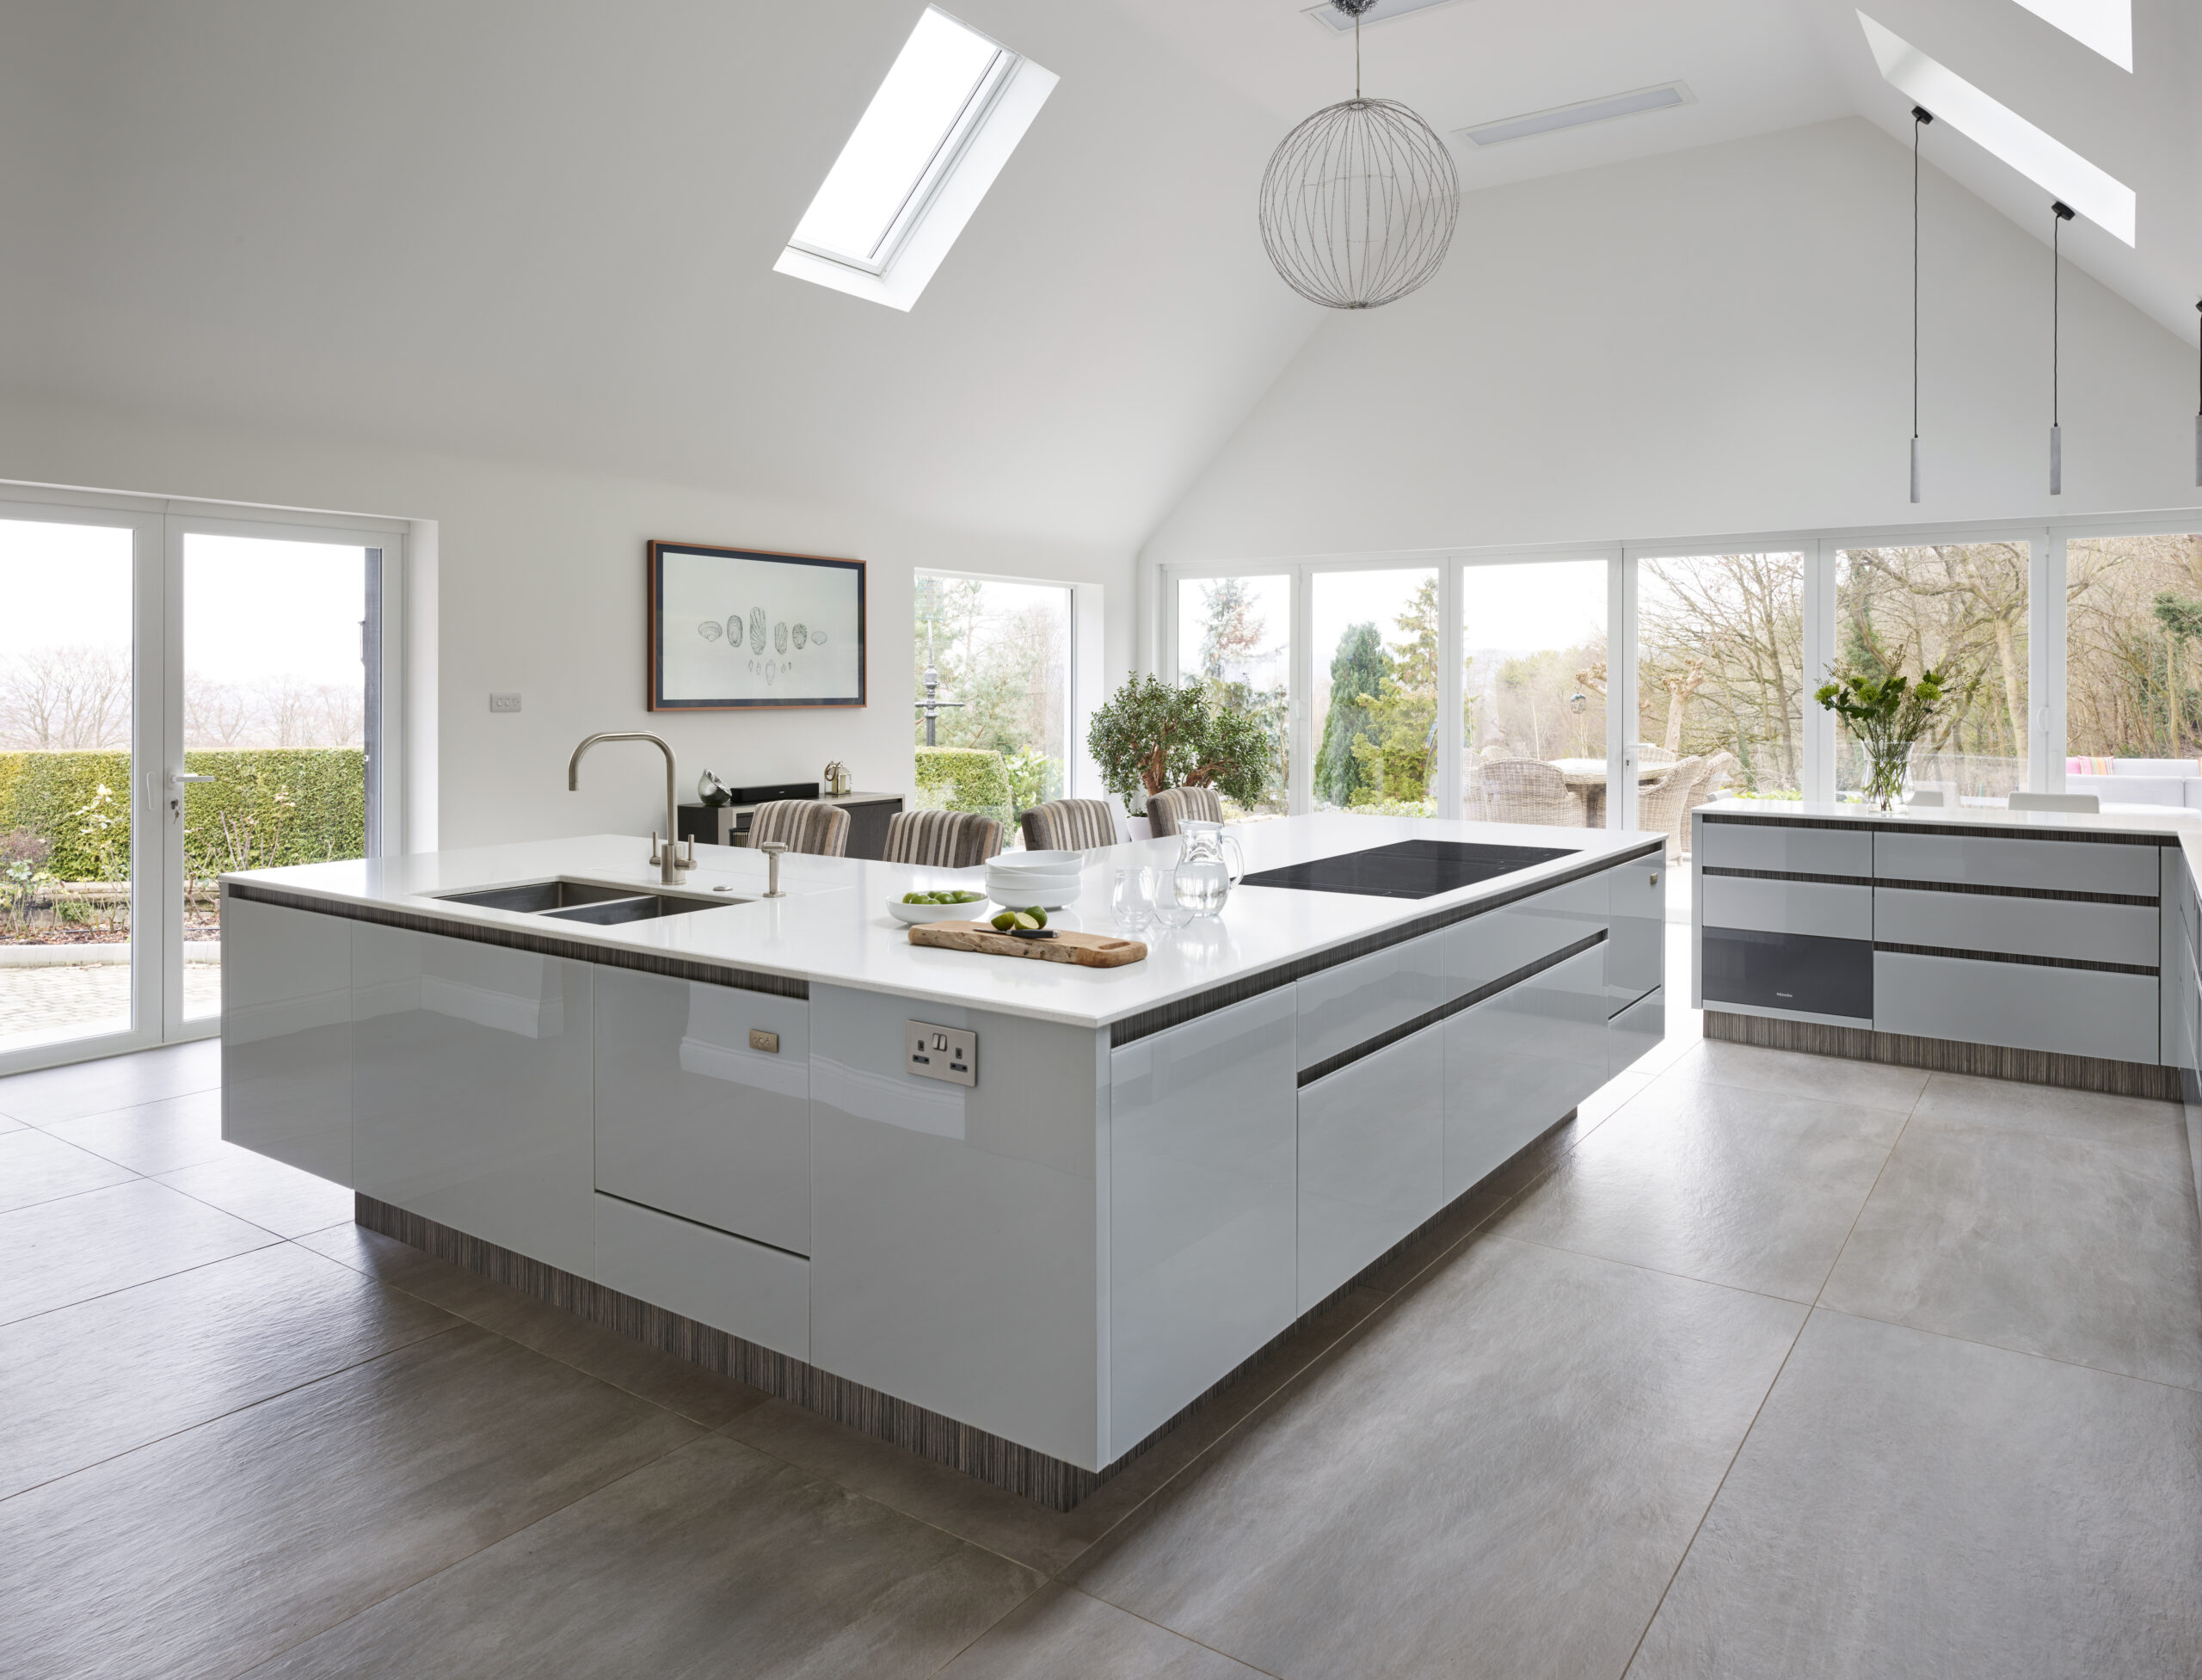 Simon Taylor Furniture - Butlers Cross - Kitchen Island